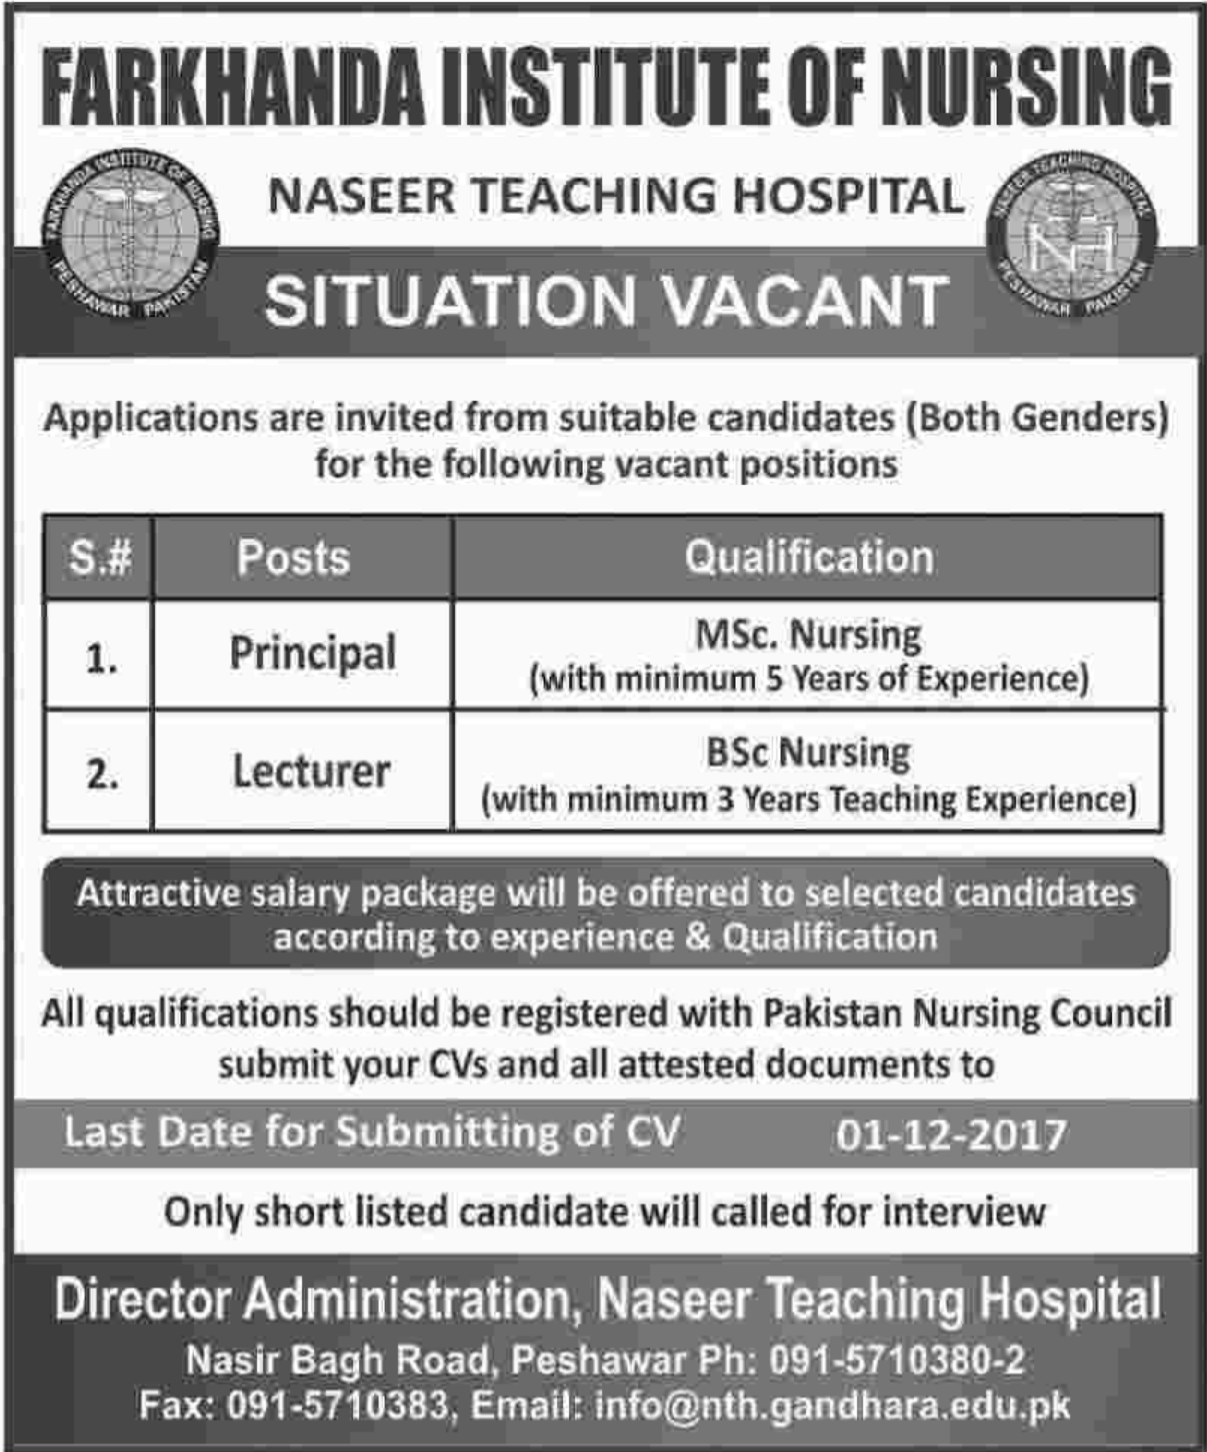 Farkhanda Institute of Nursing Peshawar Jobs 2017